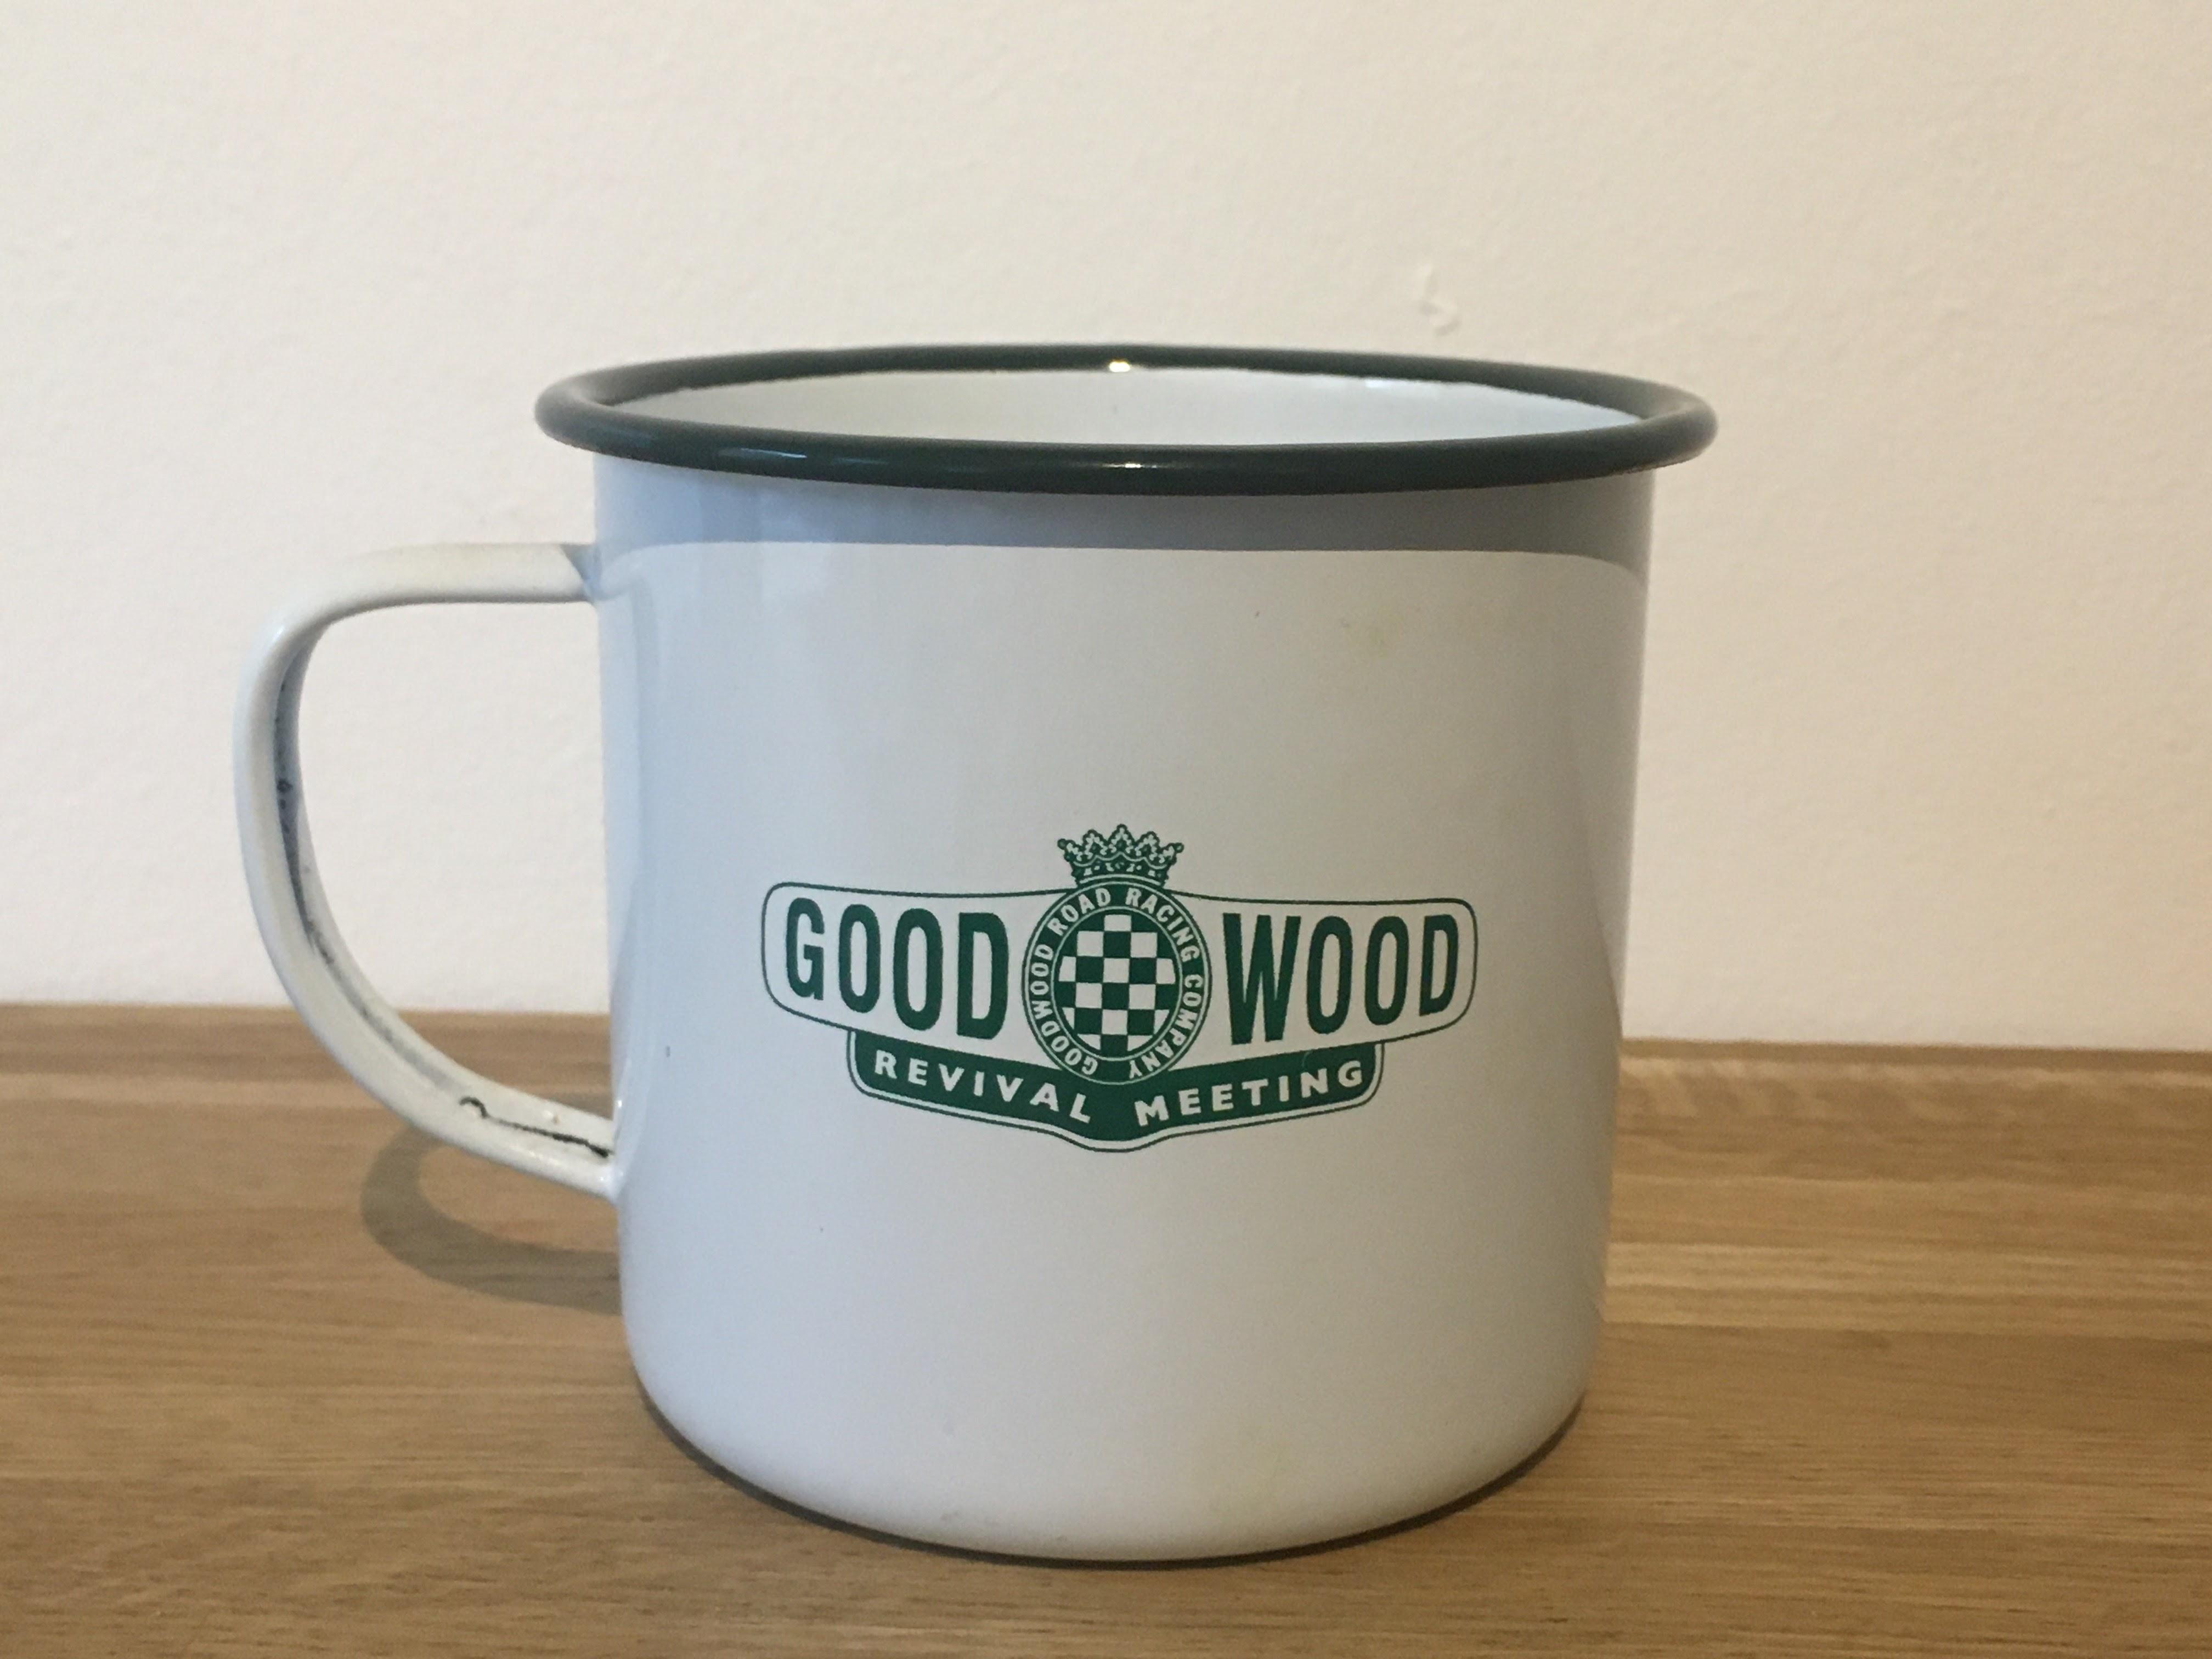 Official Goodwood Revival Meeting Mug